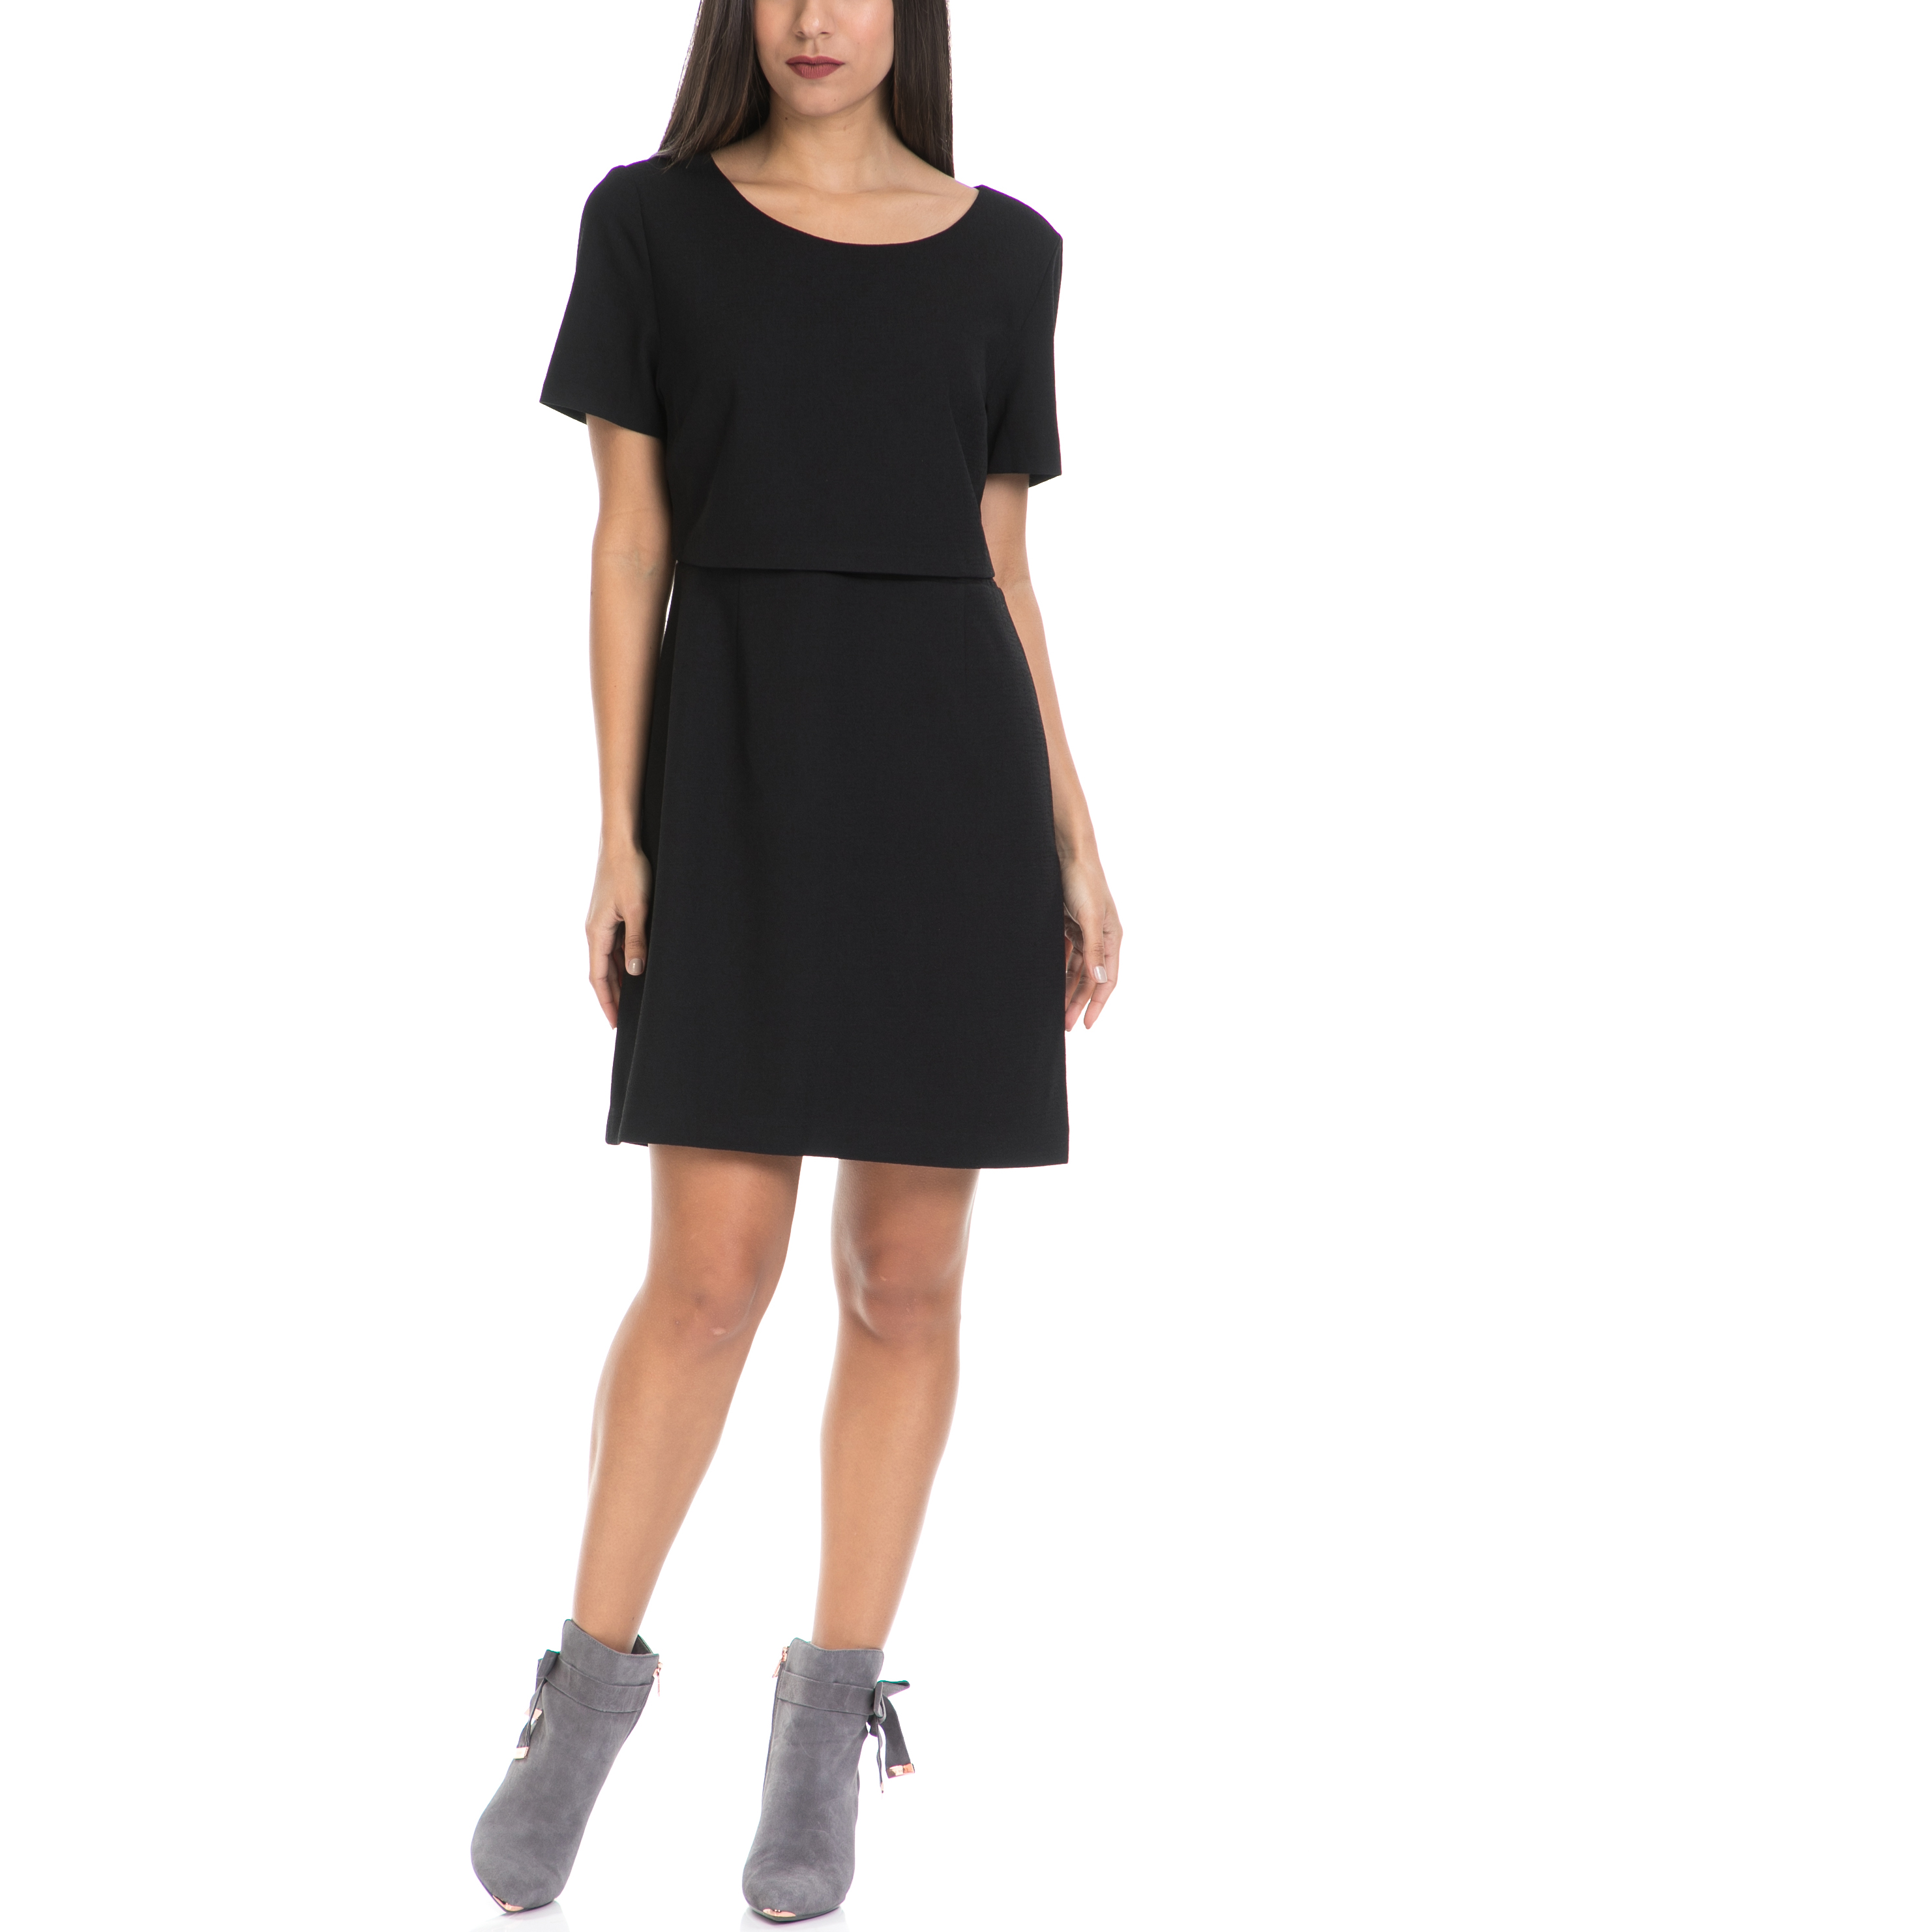 MAISON SCOTCH – Γυναικείο φόρεμα MAISON SCOTCH μαύρο